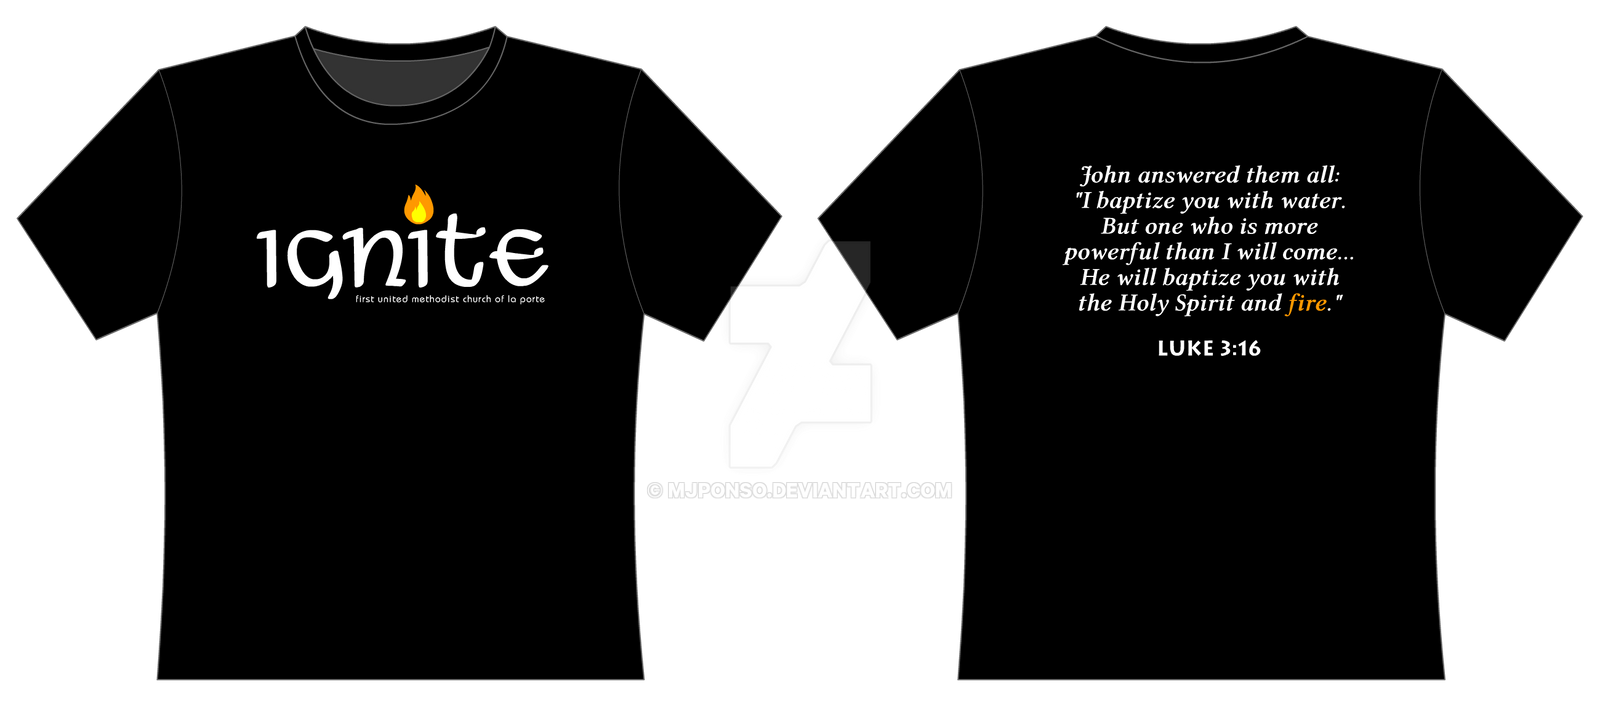 T shirt design youth - Design T Shirt Hk T Shirt Design Youth Ignite T Shirt Design By Mjponso